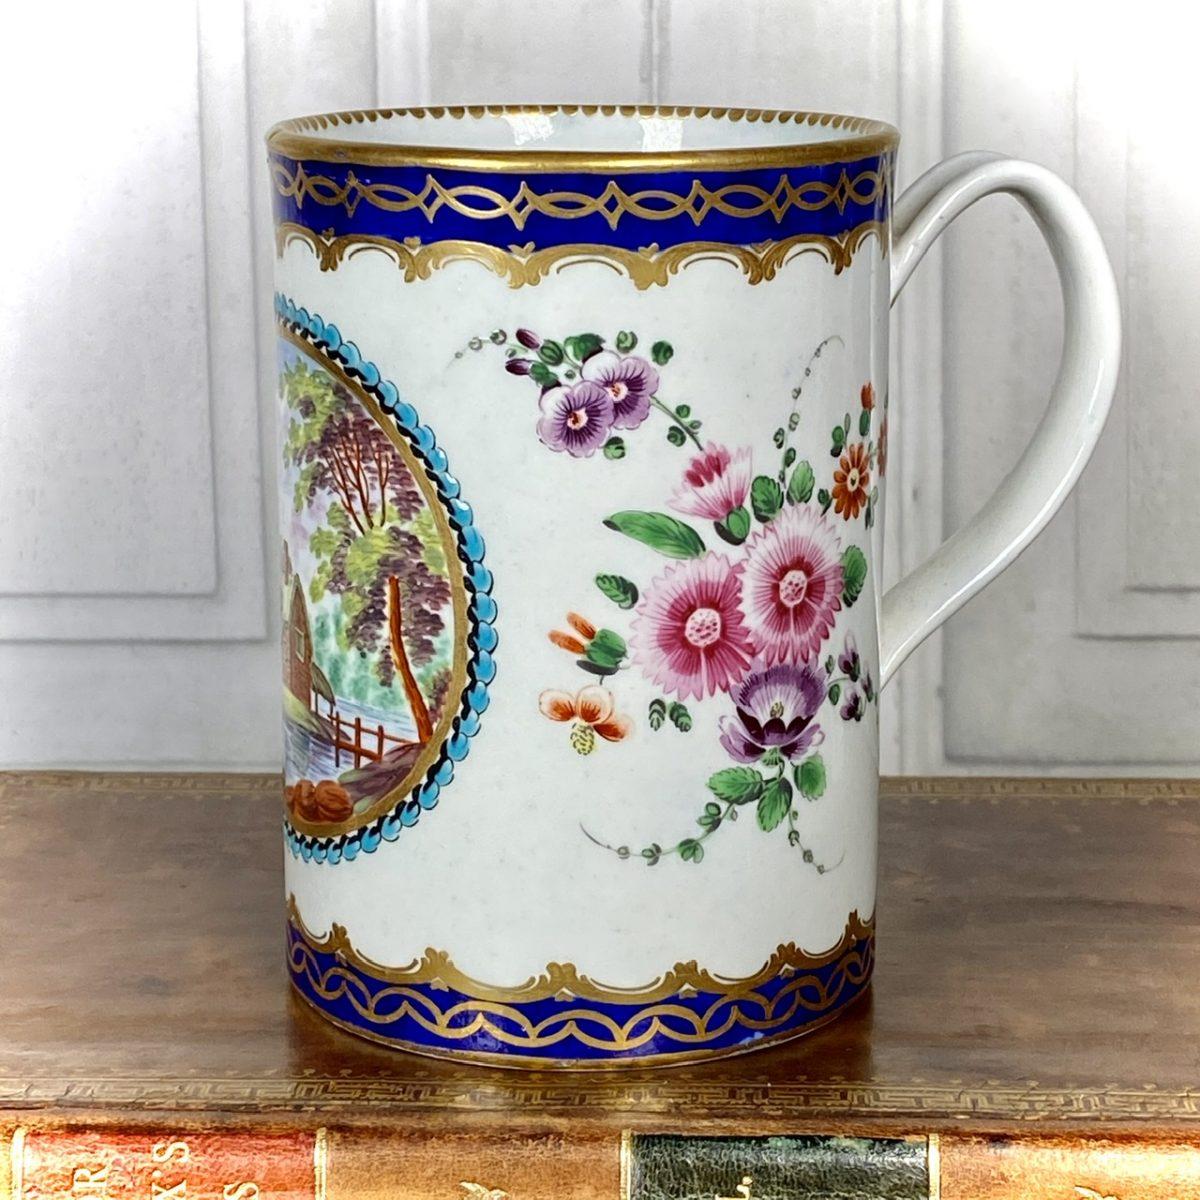 C18th Worcester Porcelain Dalhousie Pattern Mug.